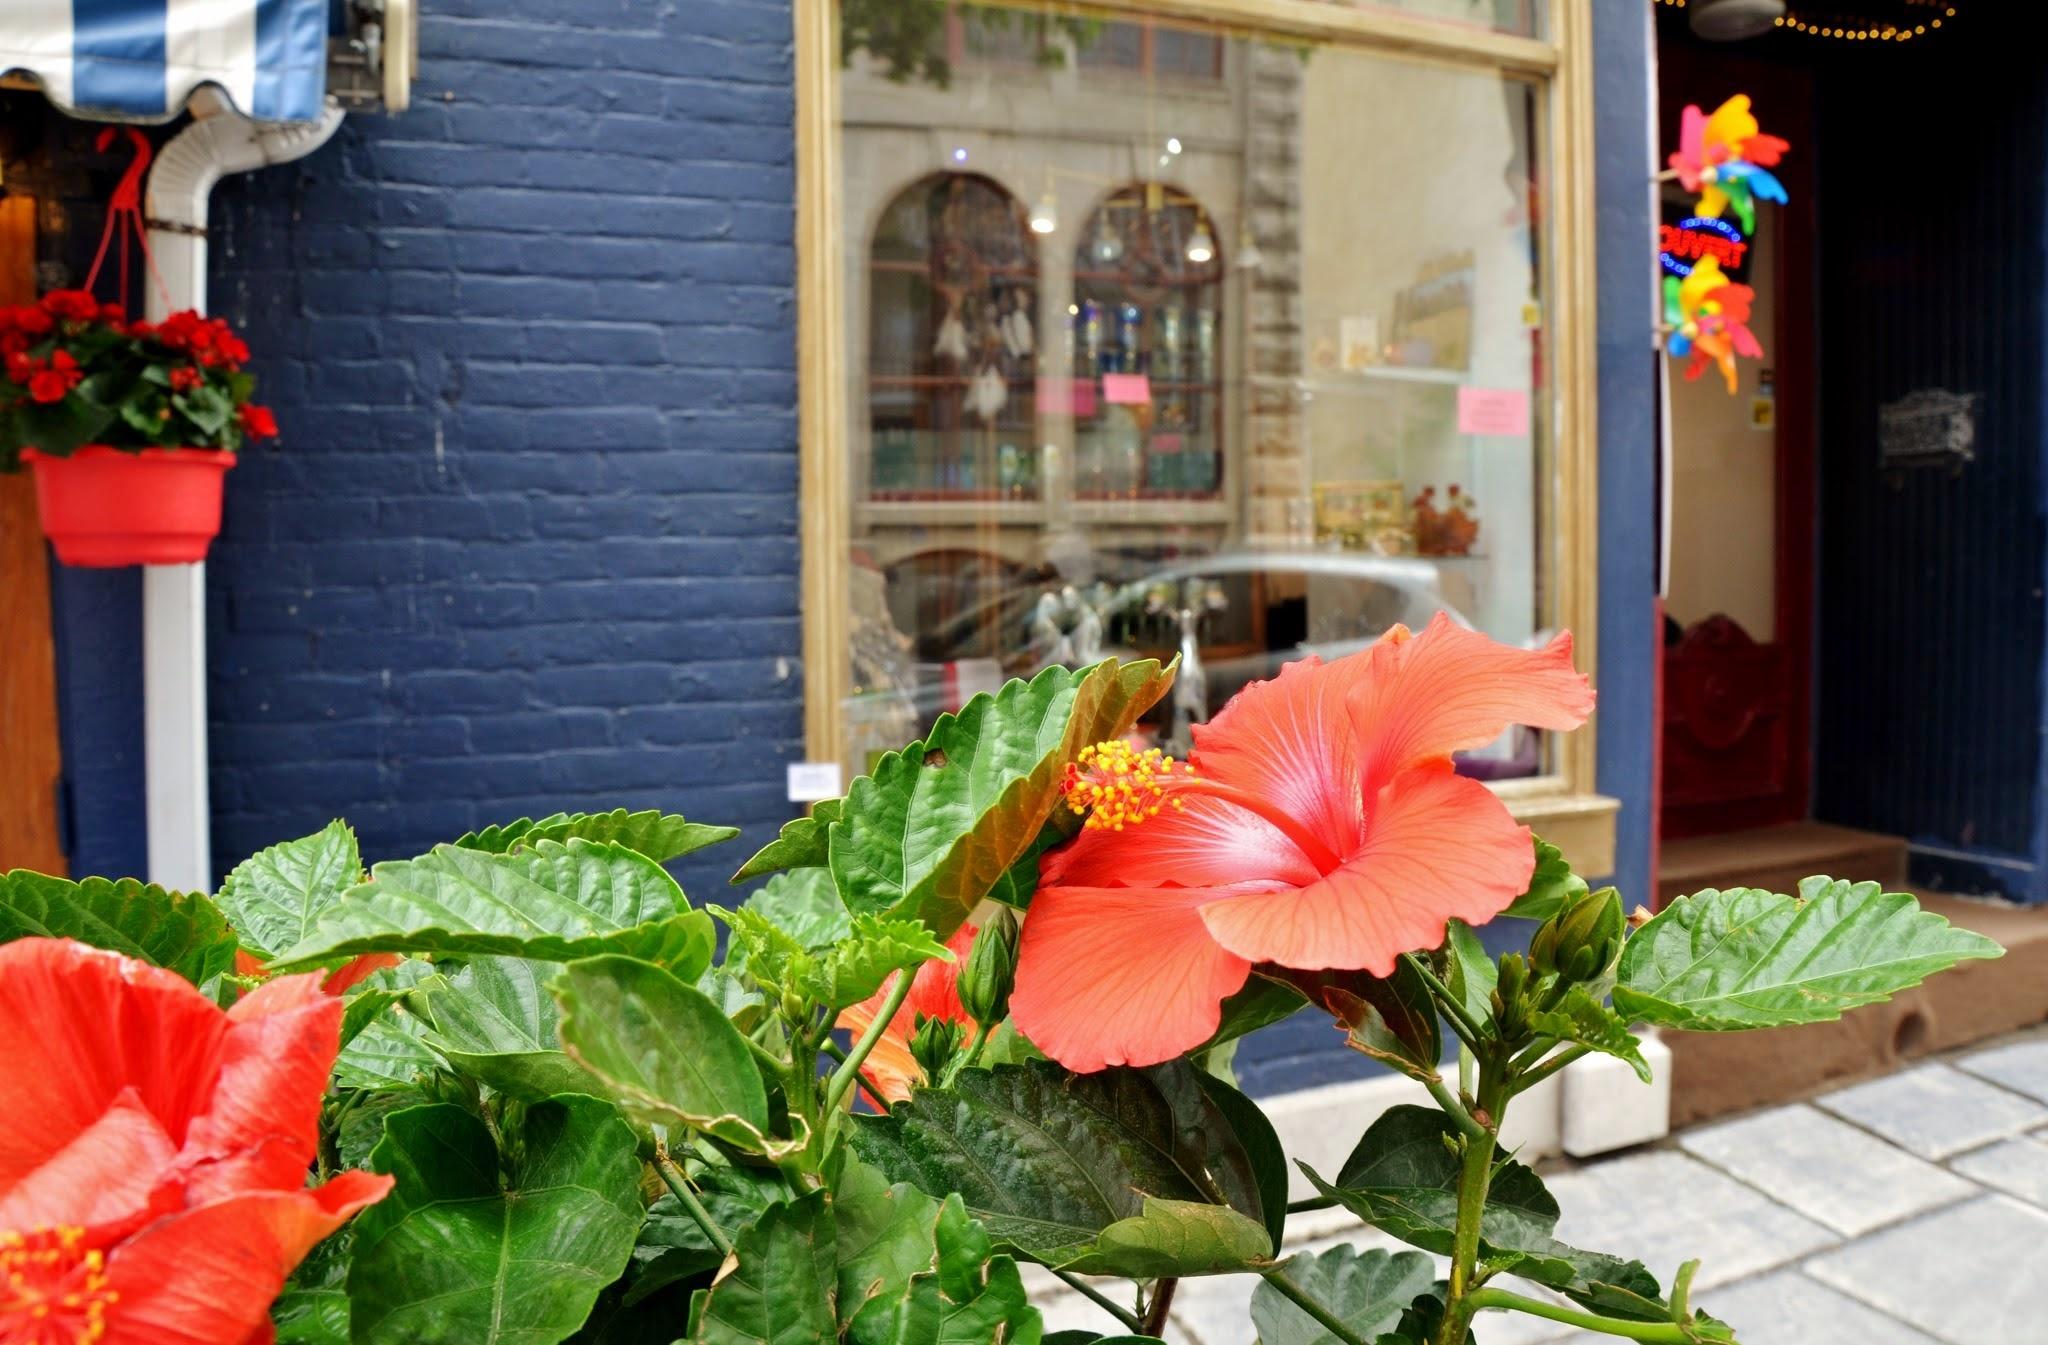 Hibiscus resplandissant de bonheur by real.michaud.5036